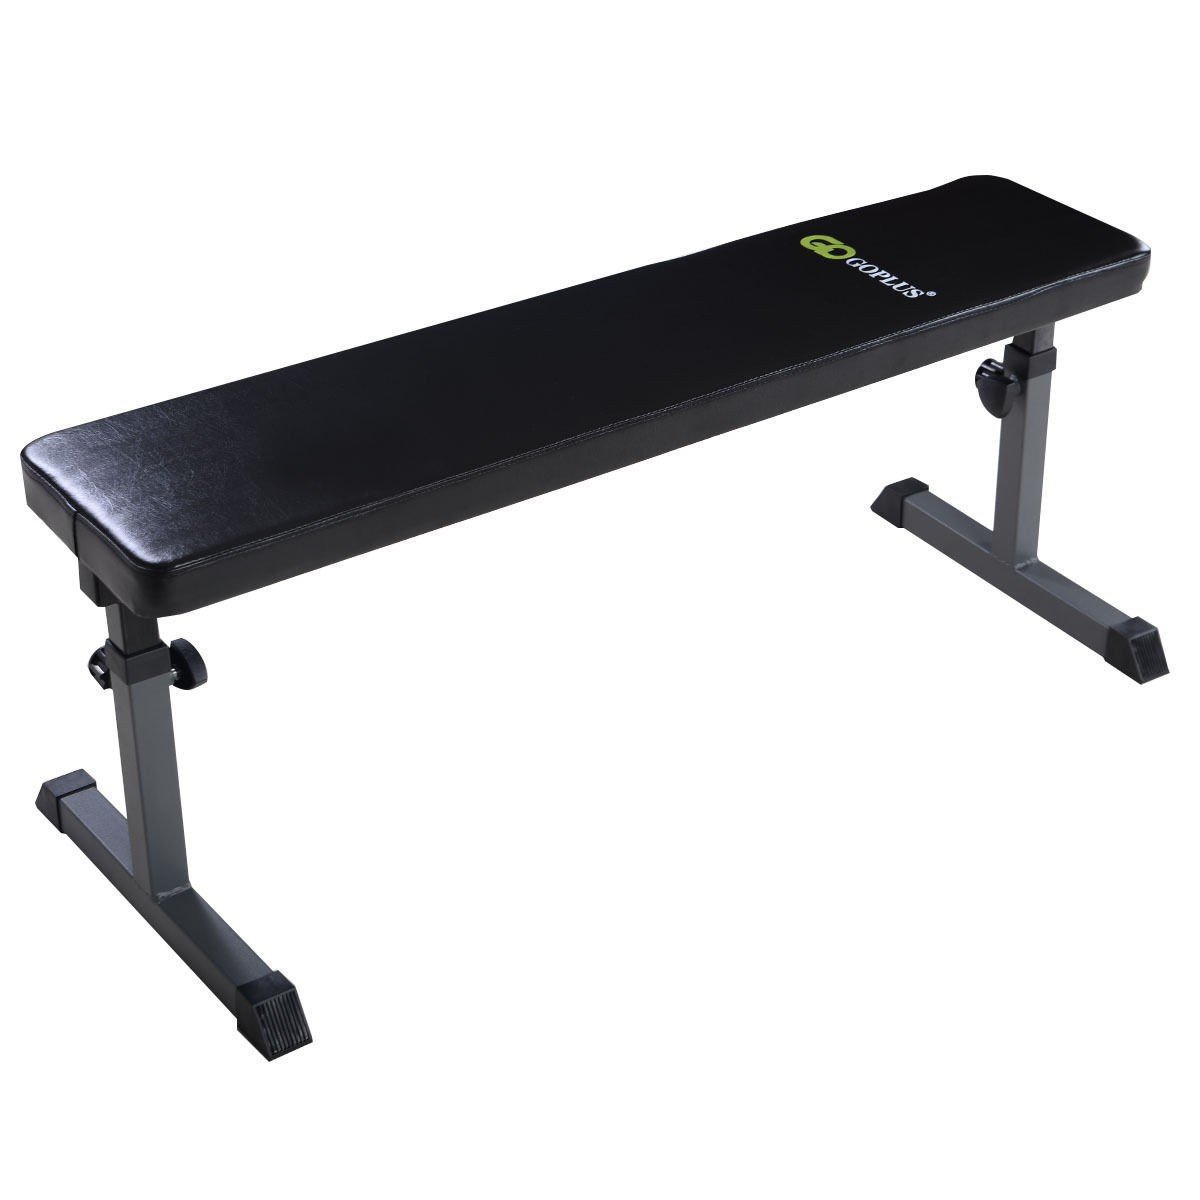 myeasyshoppingマッスル調節可能なフィットネスSit UpベンチGoplus調節可能なSit UpベンチFitness Workout重量Lift練習ジムホーム B07D7V7WNG